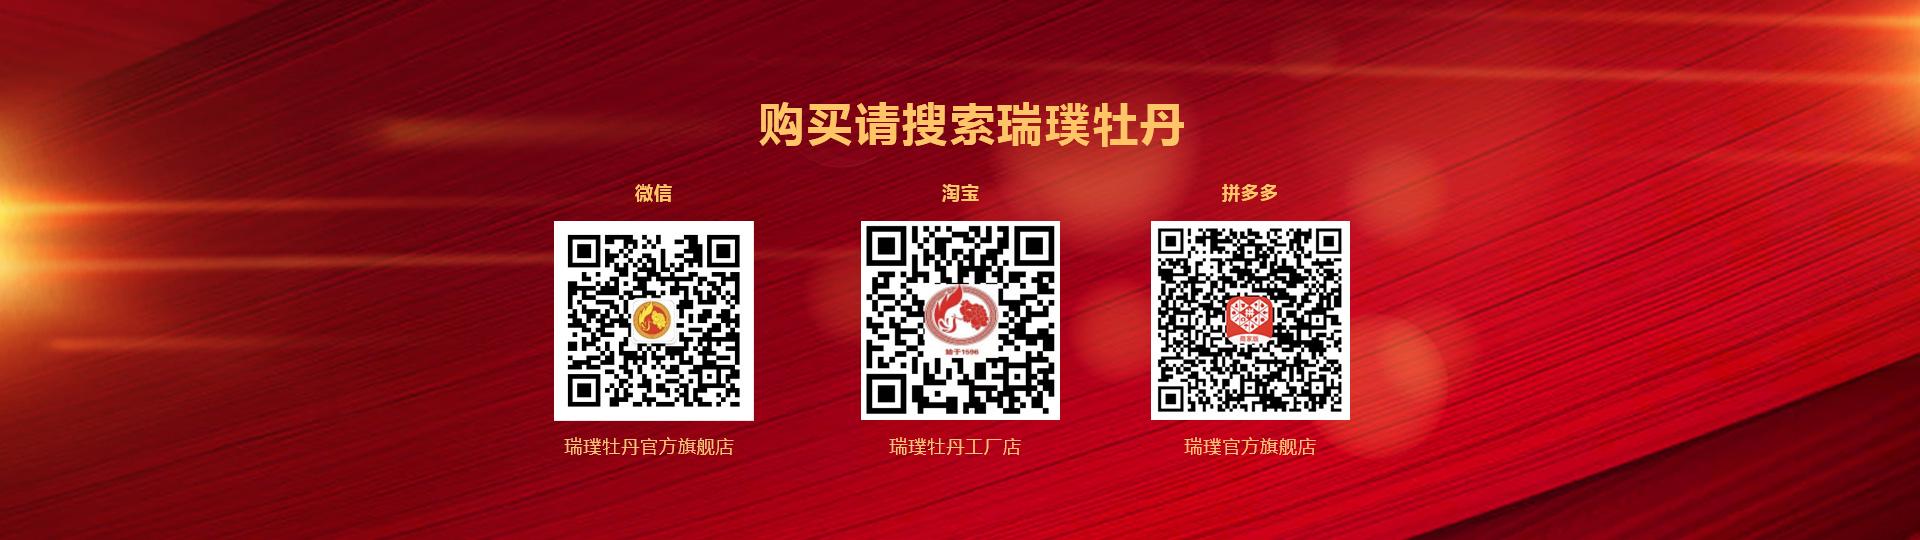 http://www.ruipumudan.com/data/upload/202107/20210701114242_398.jpg